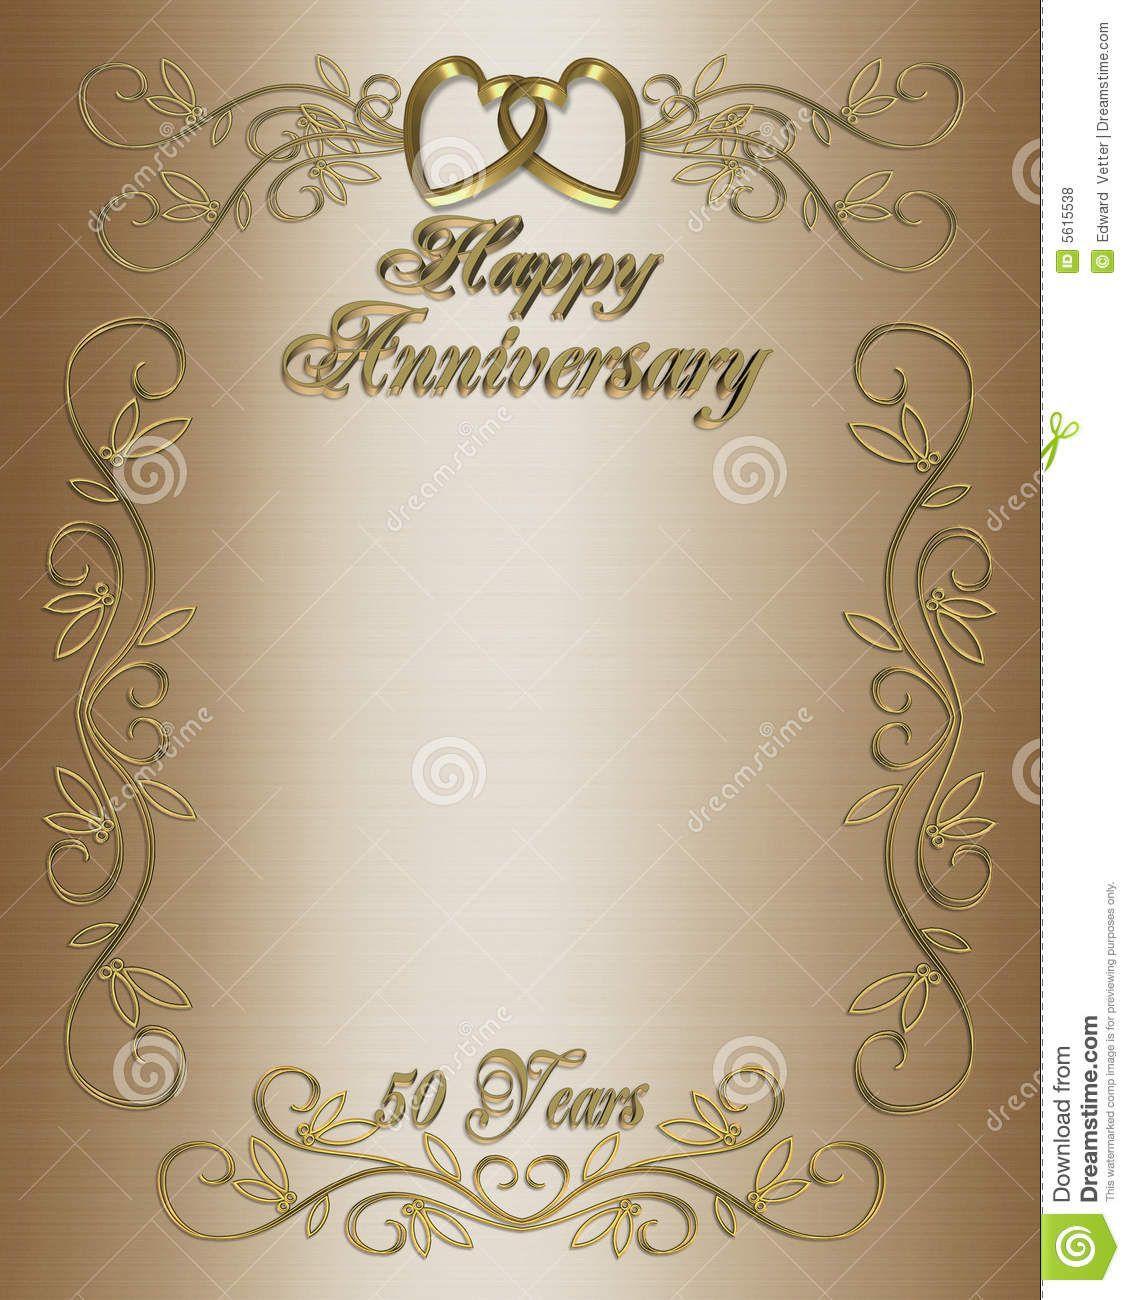 006 Wonderful Golden Wedding Anniversary Invitation Template Free High Def  50th Microsoft Word DownloadFull